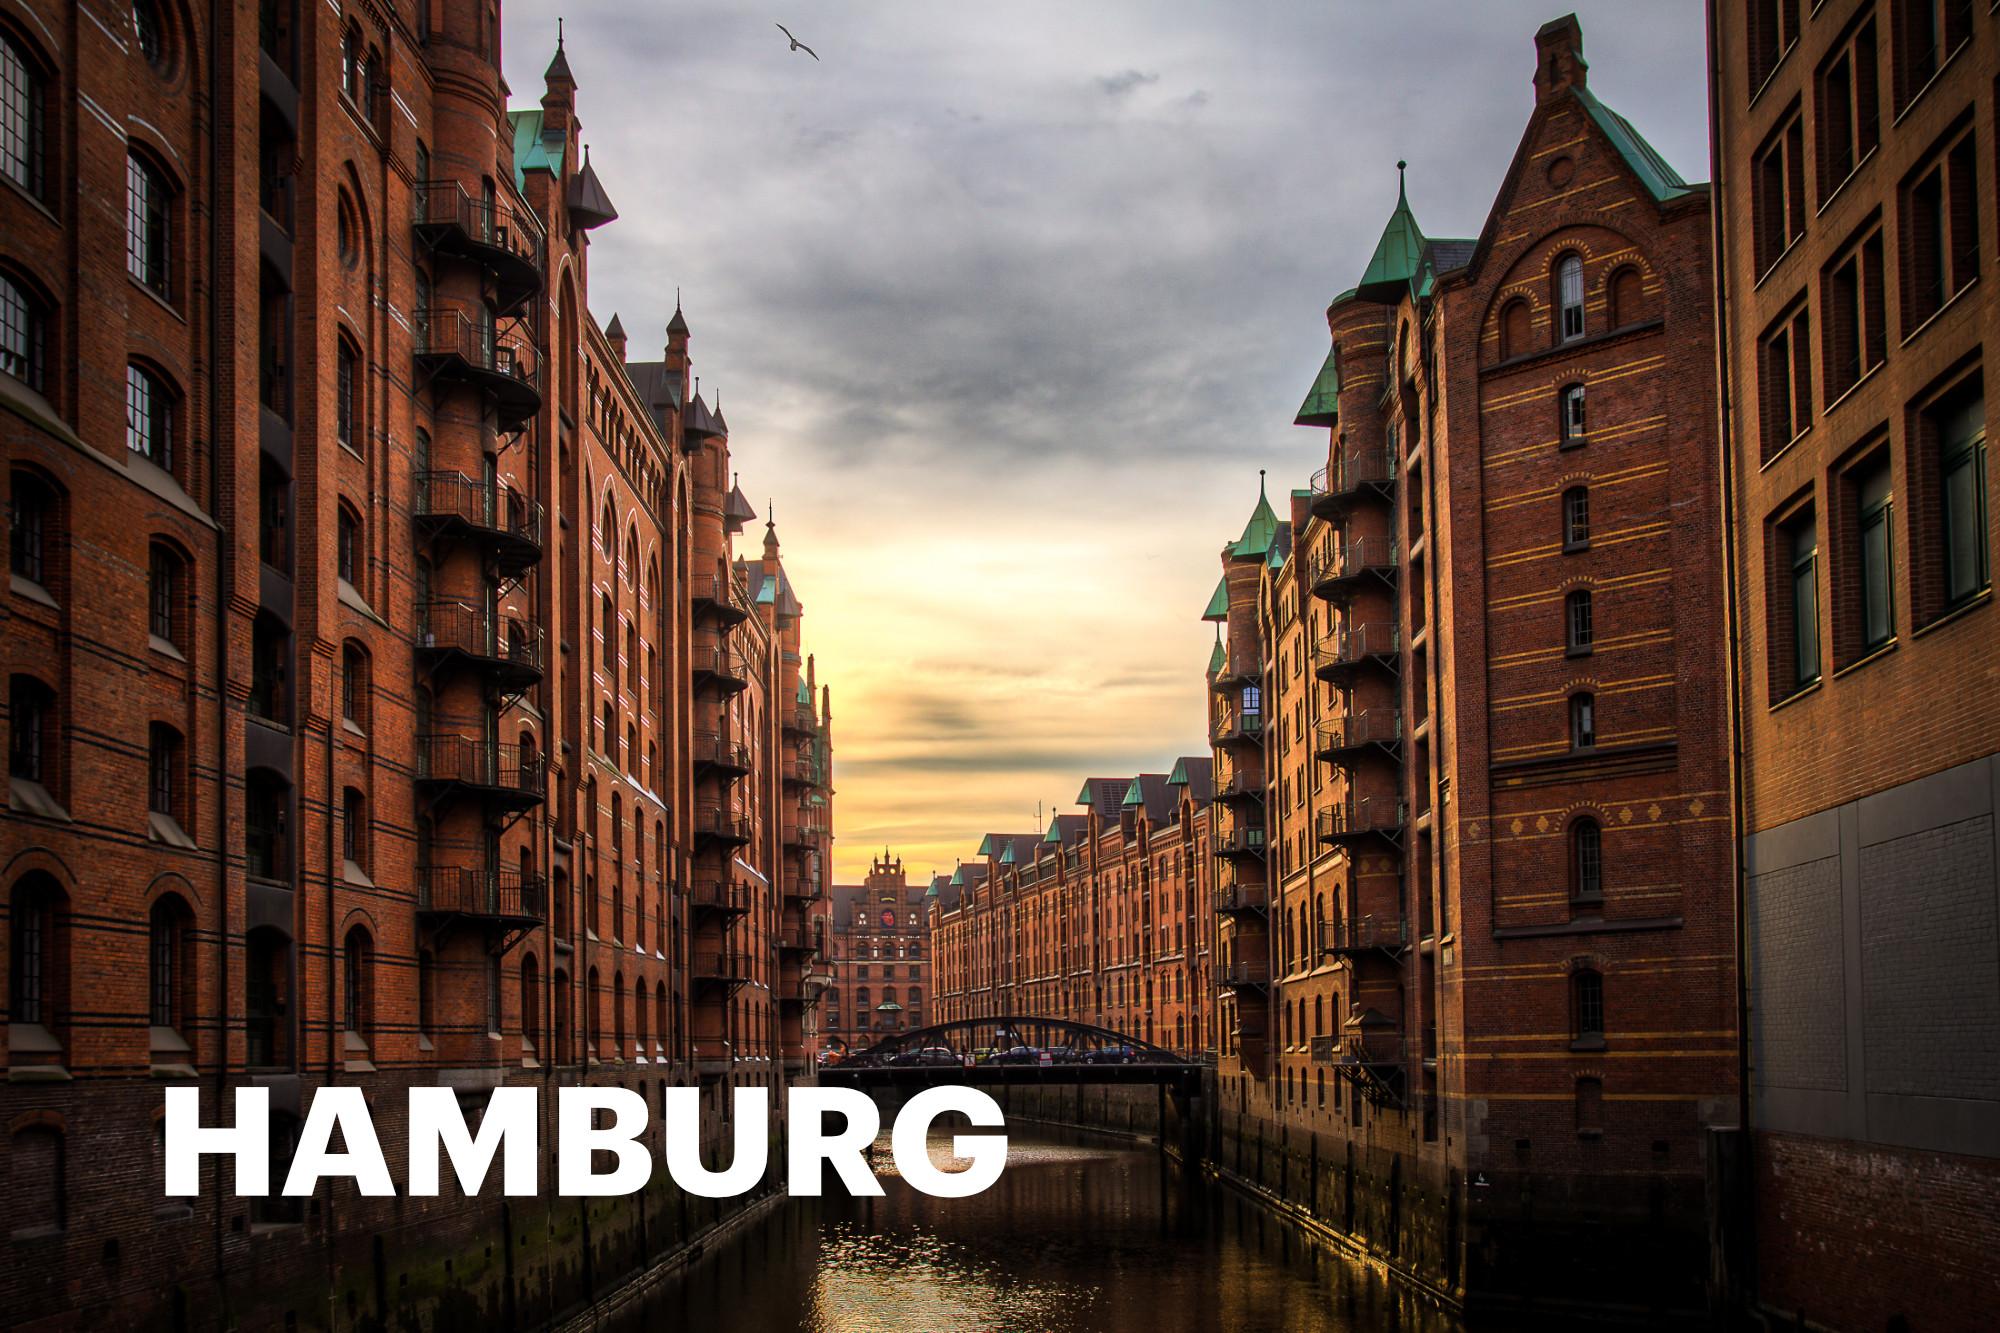 Branch Office Hamburg - Contact us